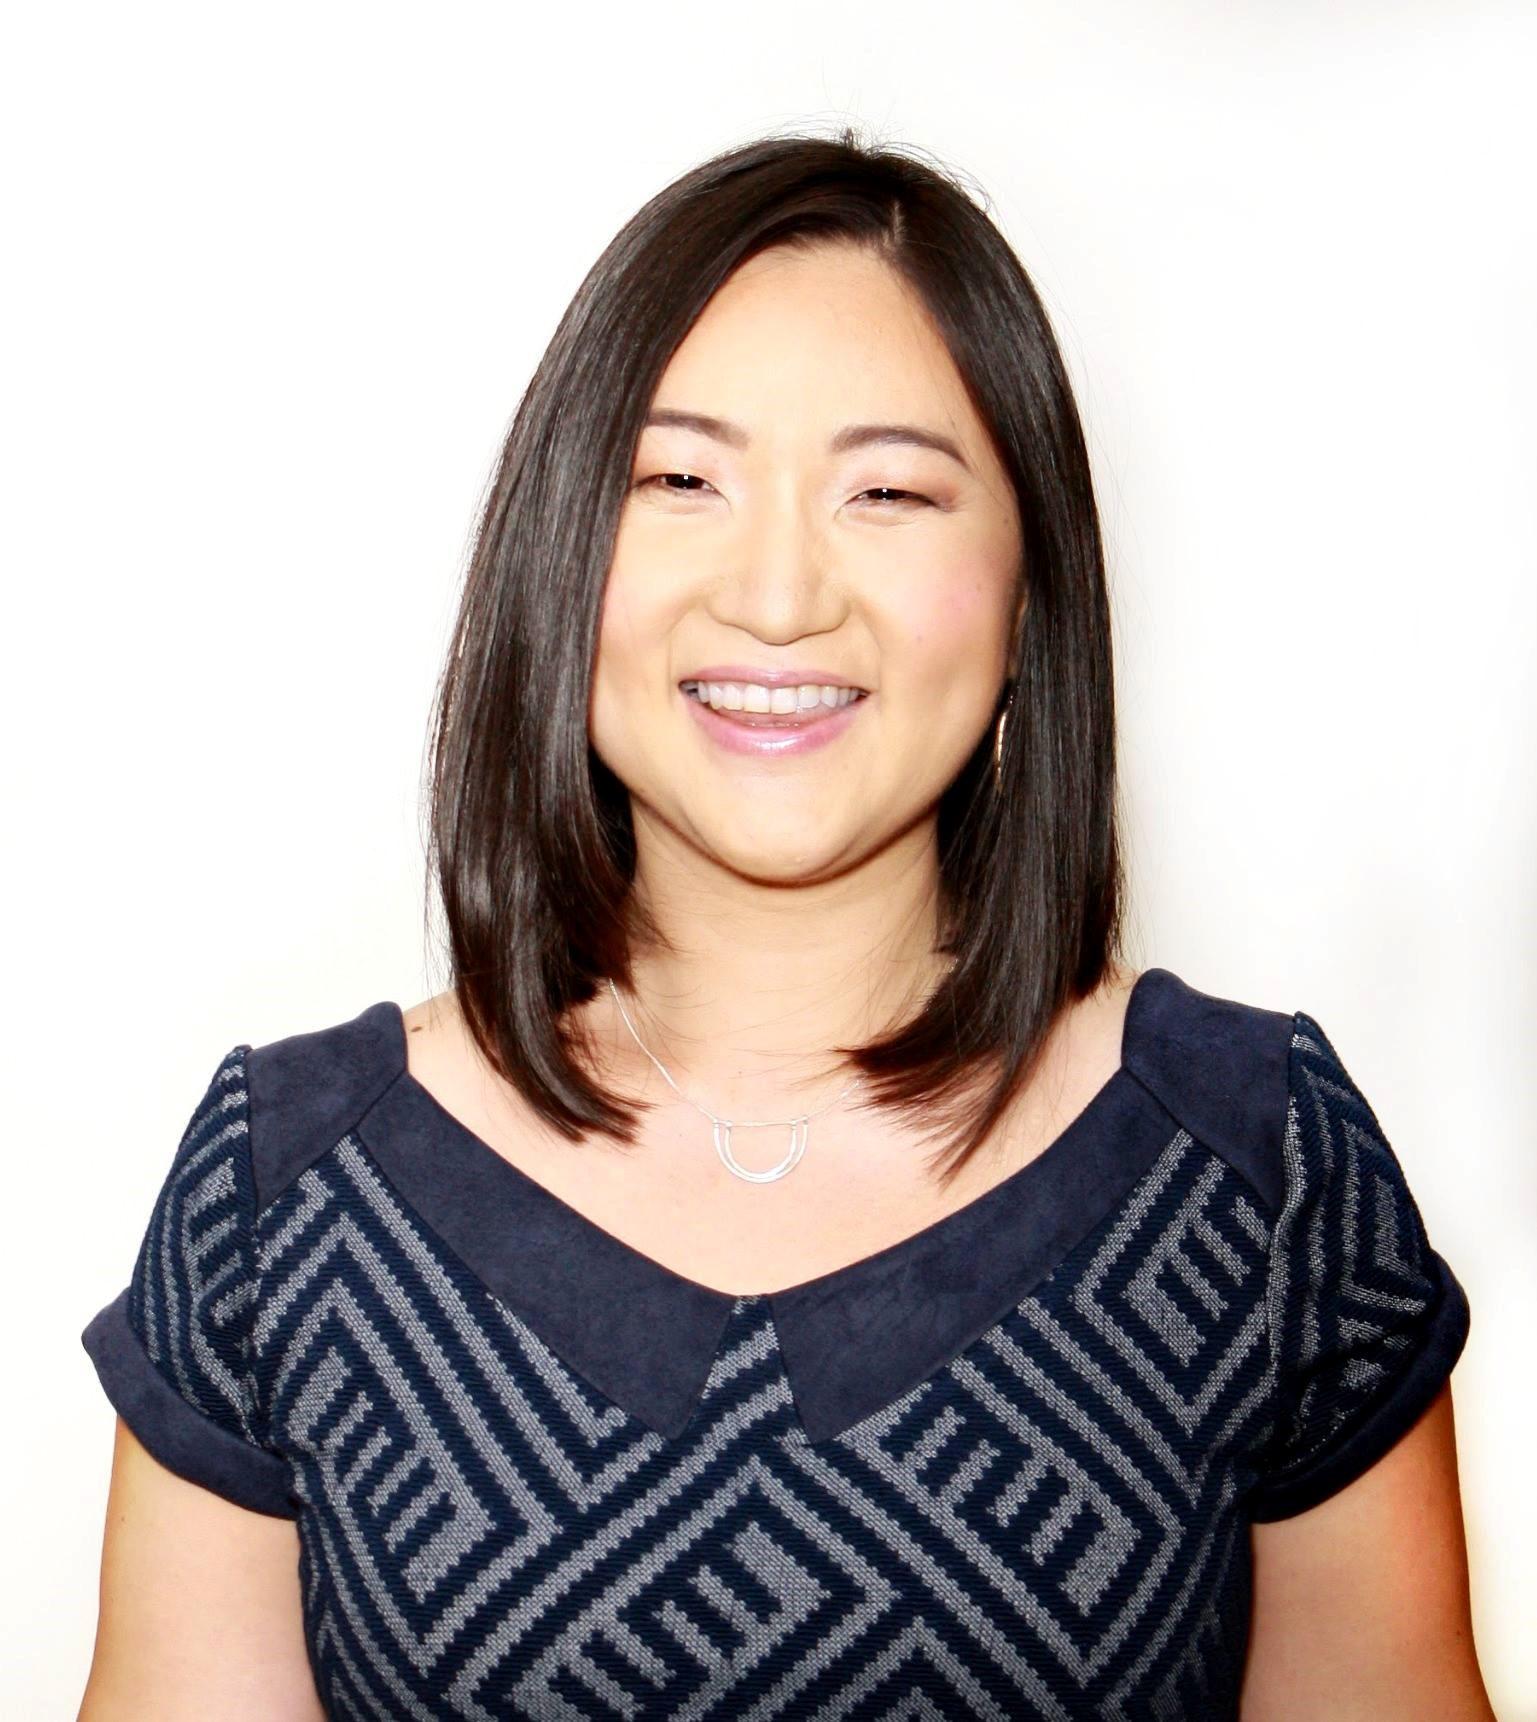 Hae Yeon Choo, Associate Professor, Department of Sociology, University of Toronto